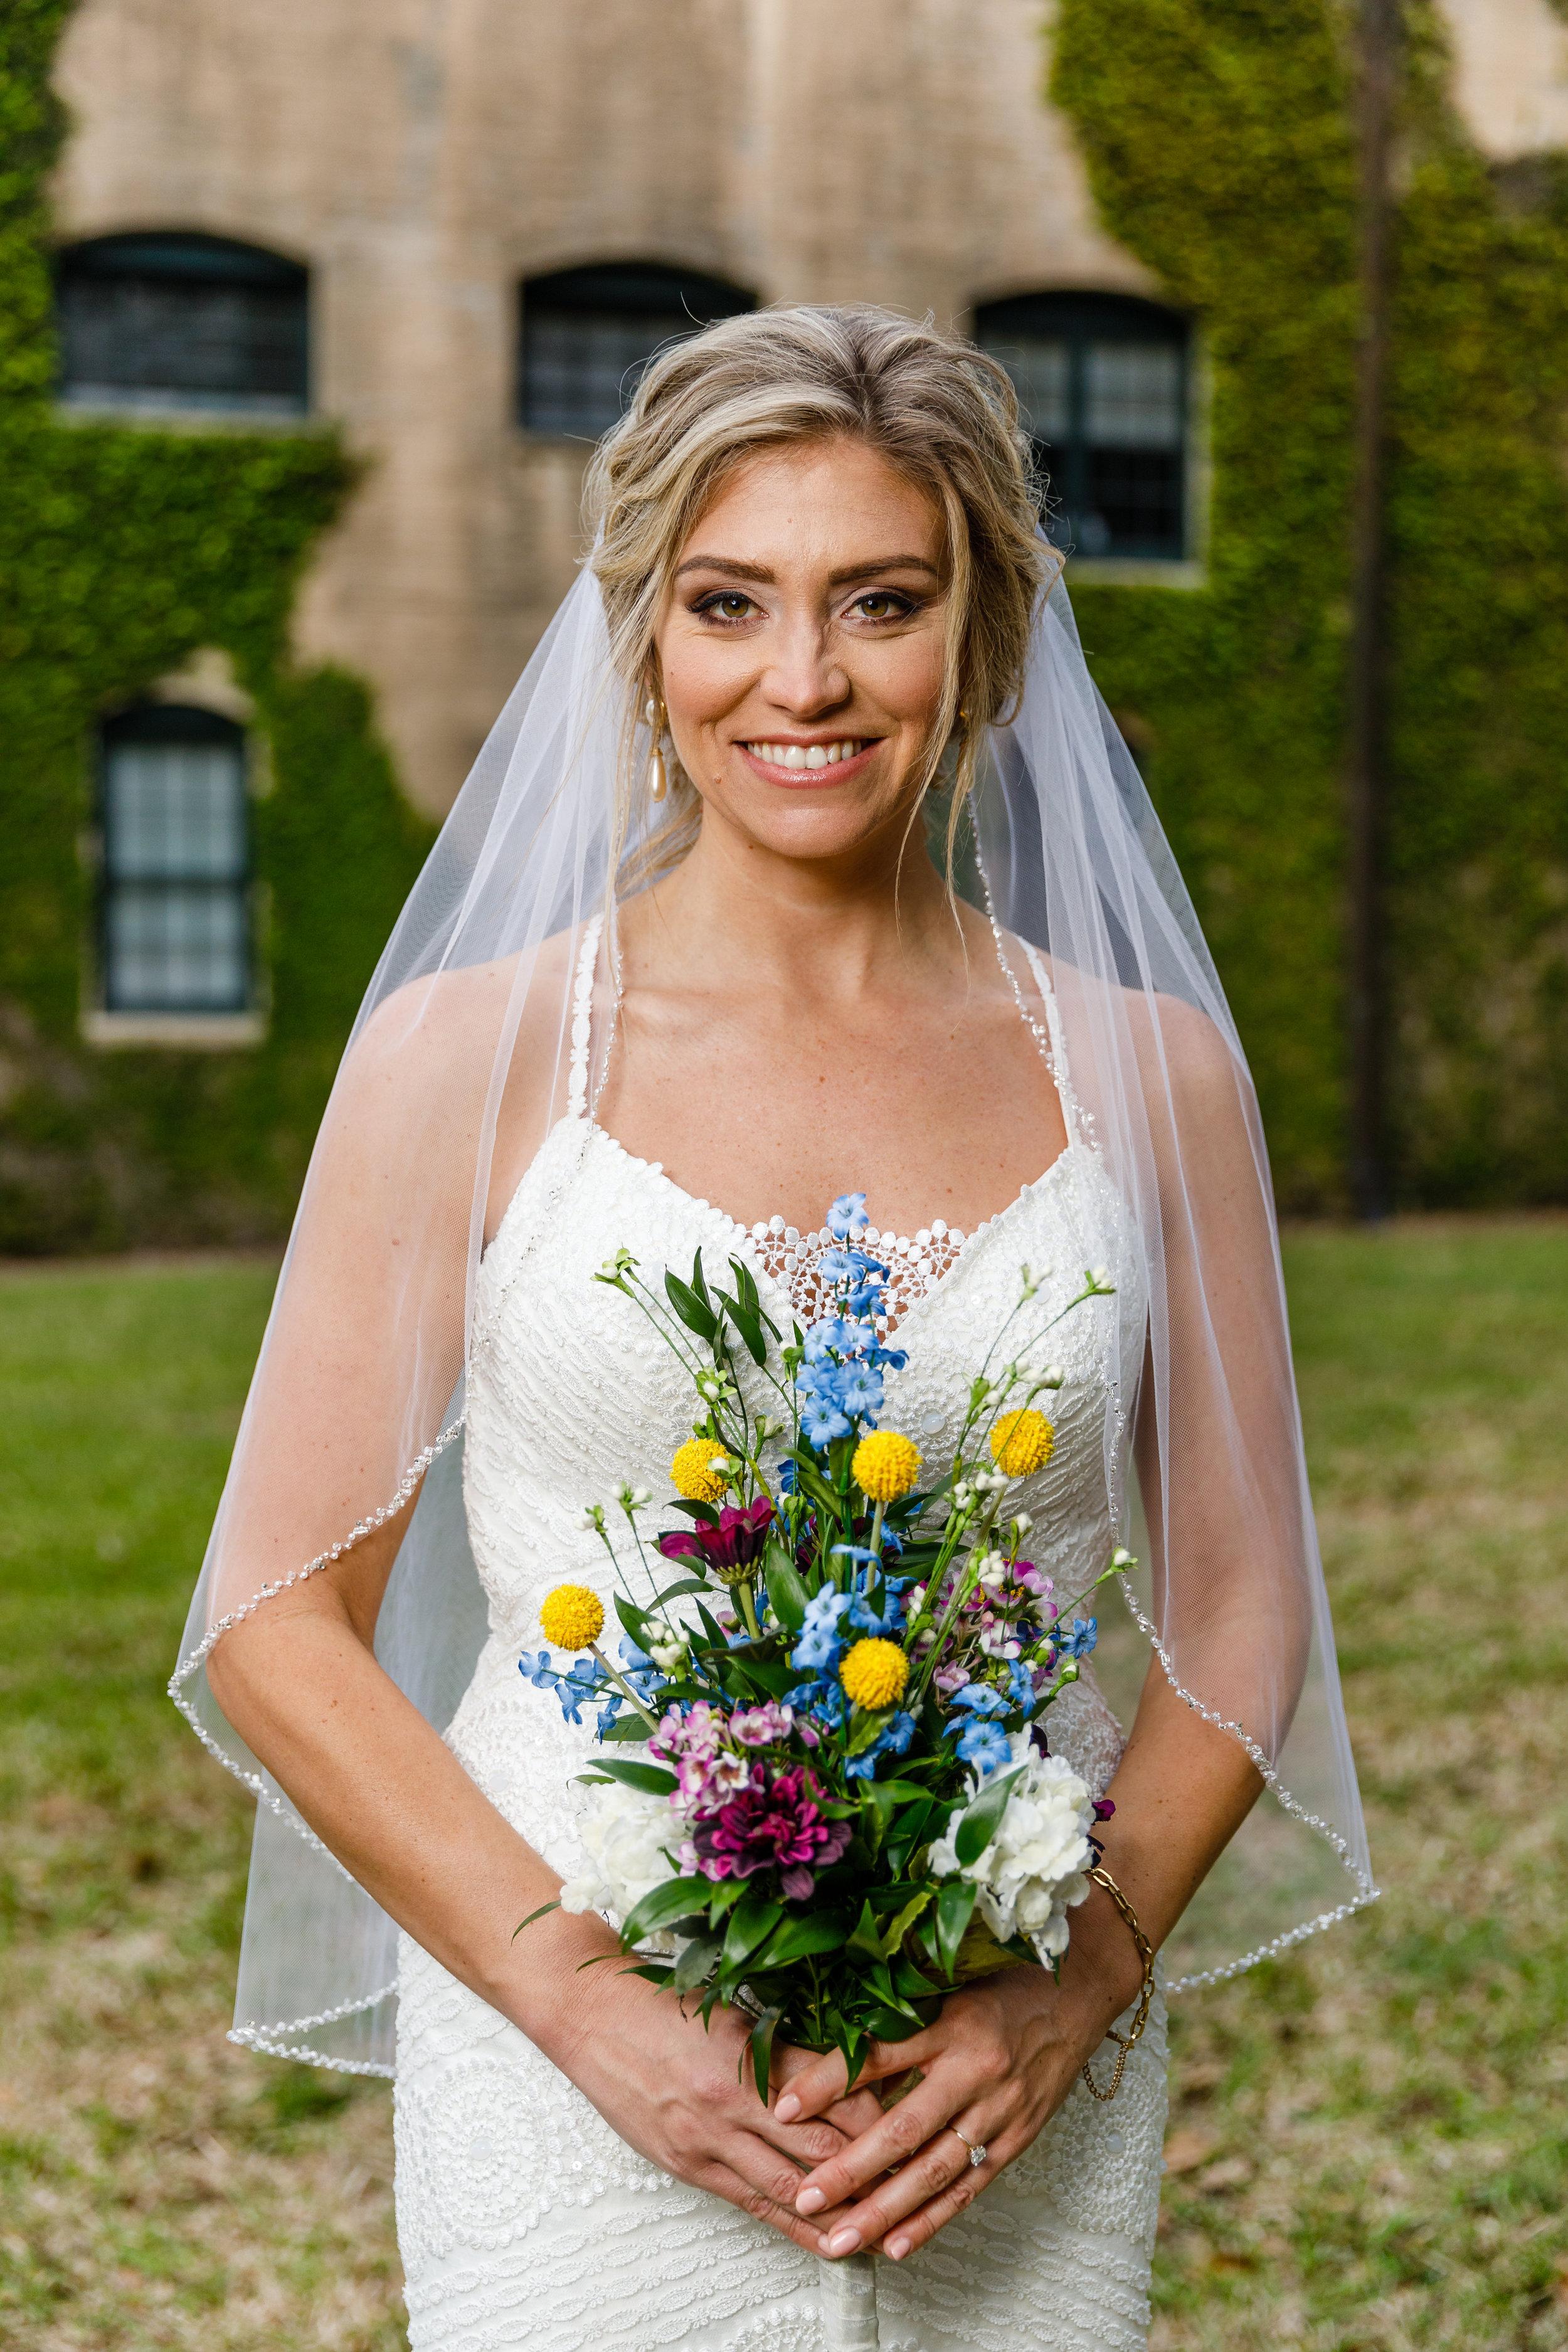 Youngsville-lafayette-portrait-family-wedding-photographer-2962.jpg